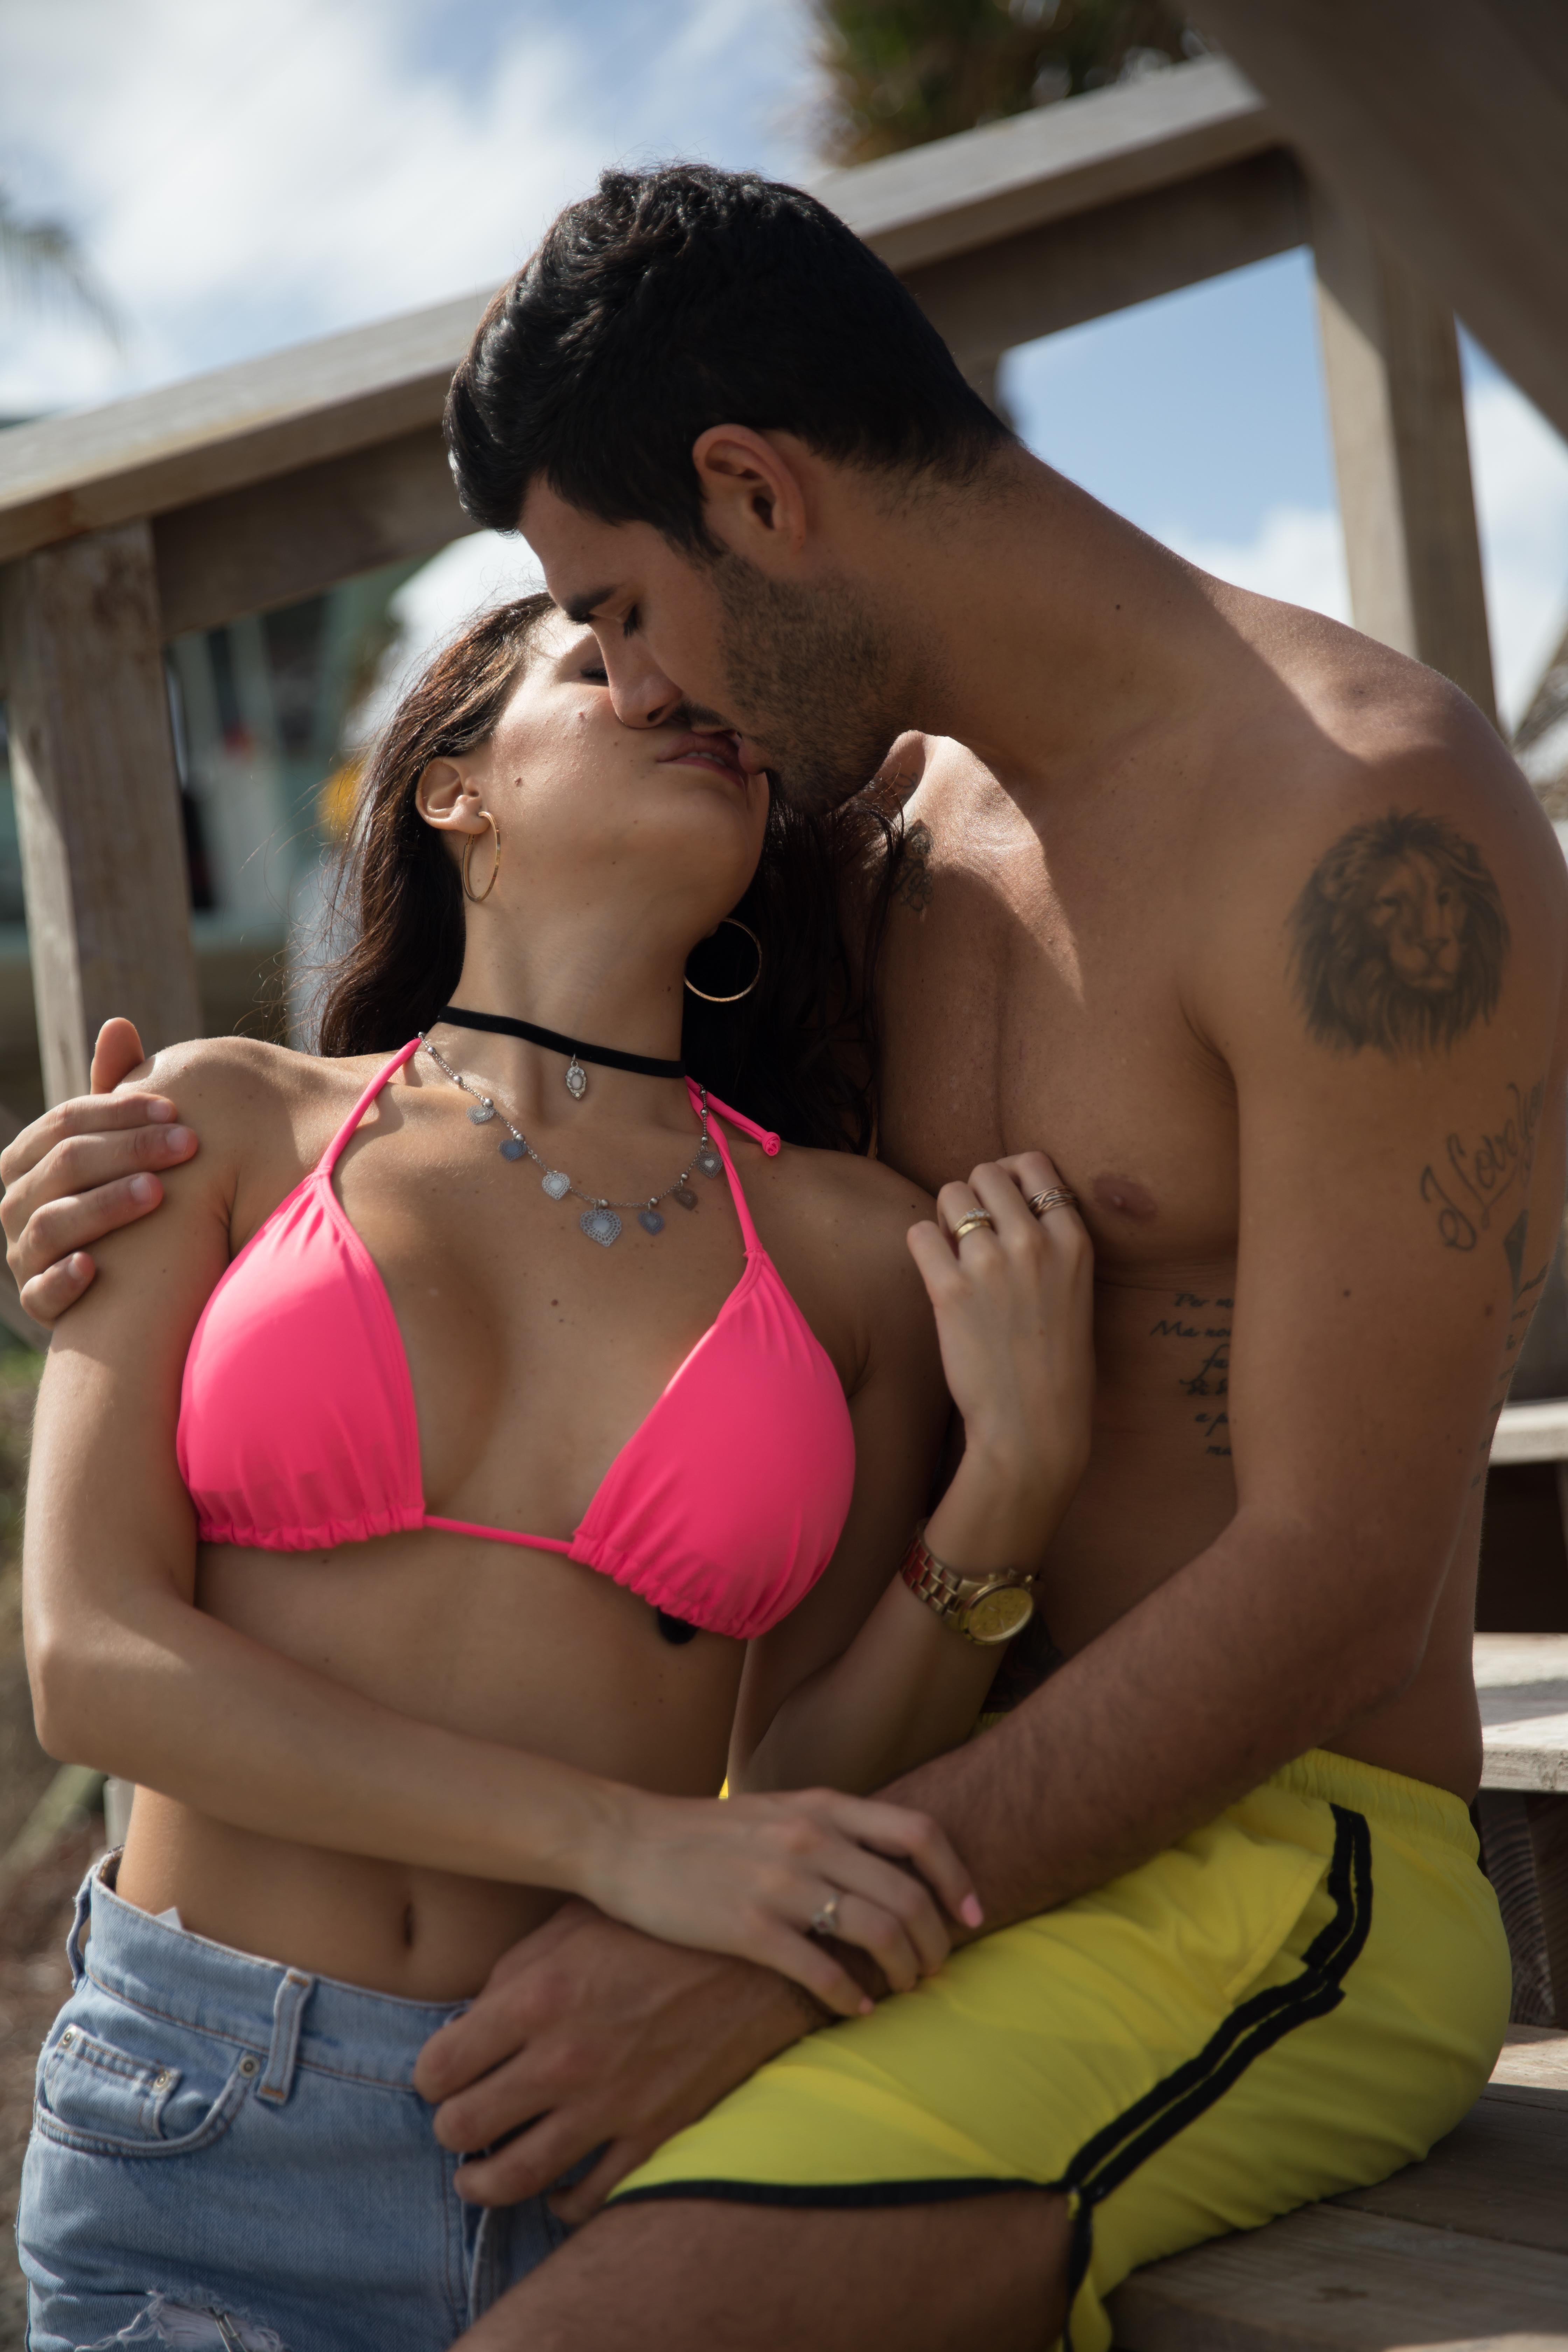 Couple in Miami, Florida